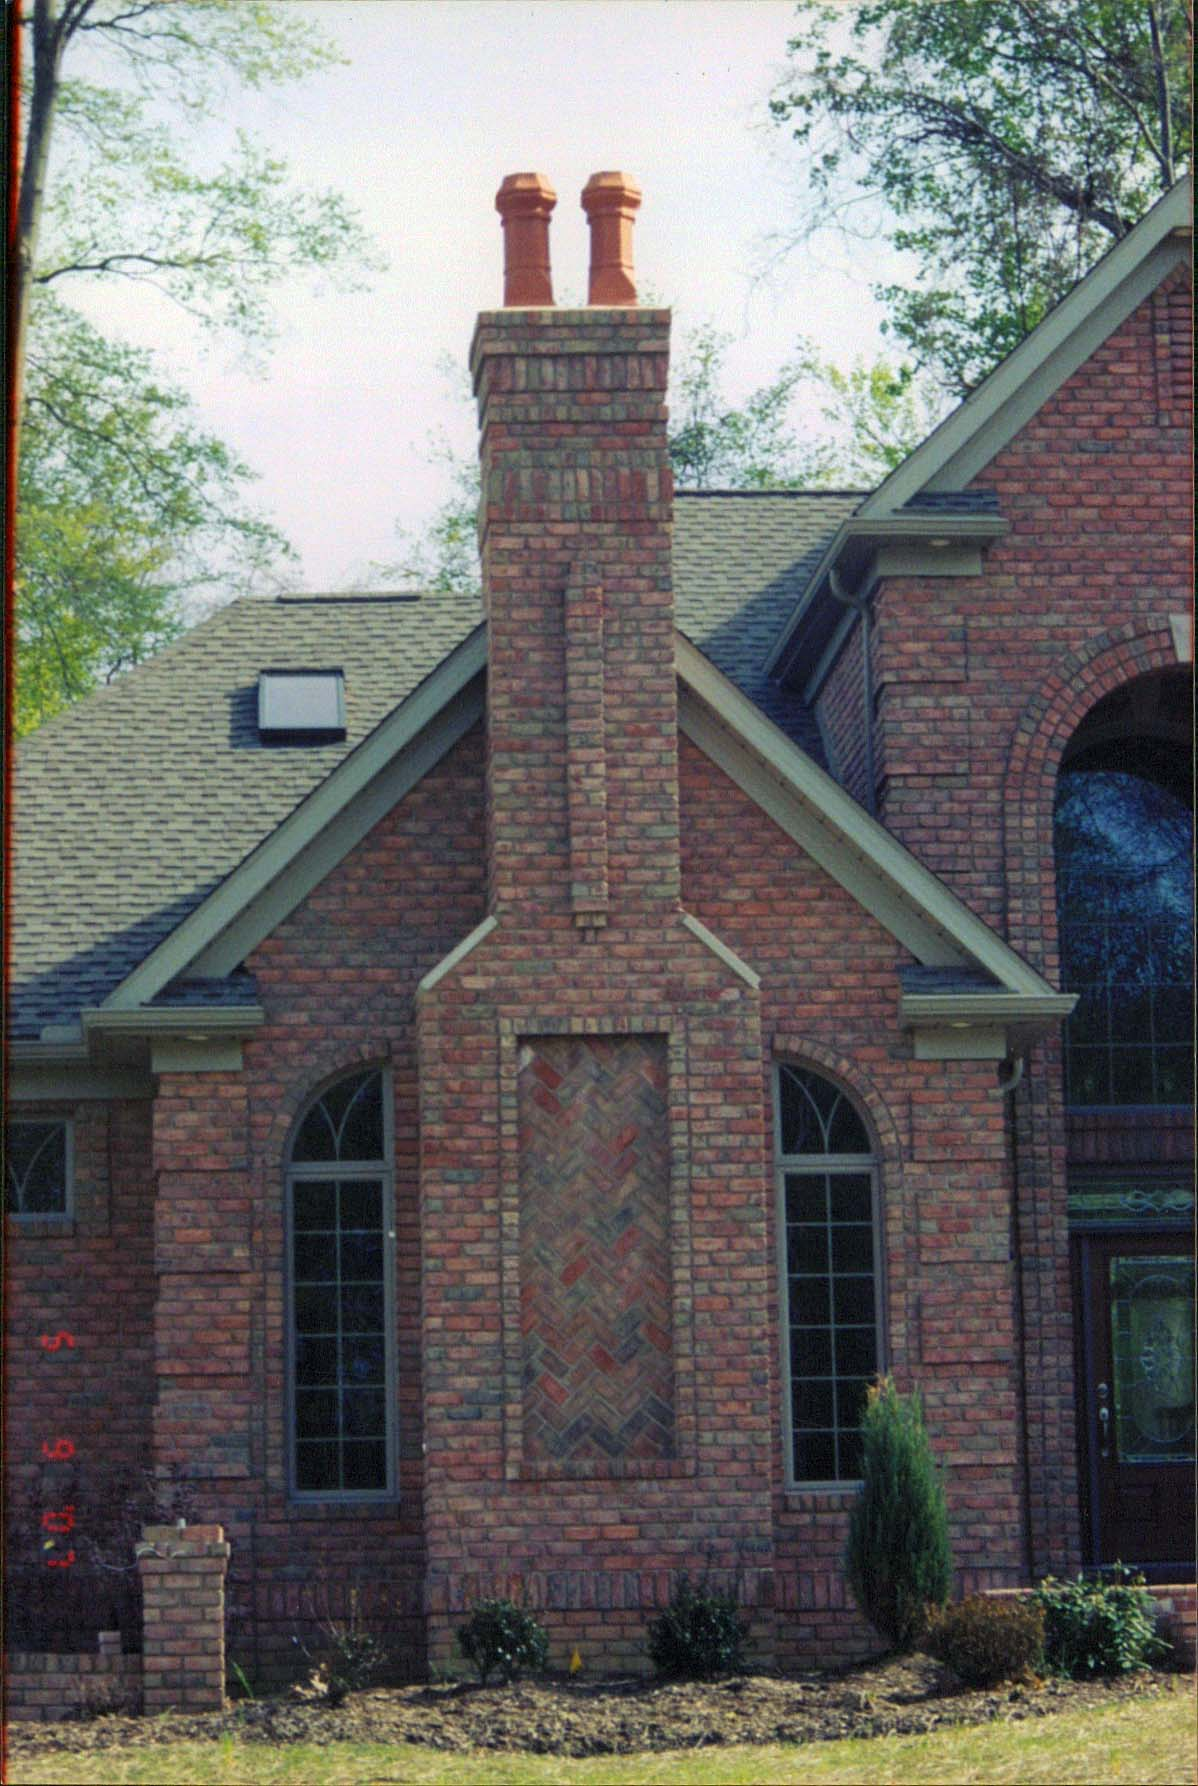 Chimney with herring bone pattern danish brick yoder for Exterior brick design patterns